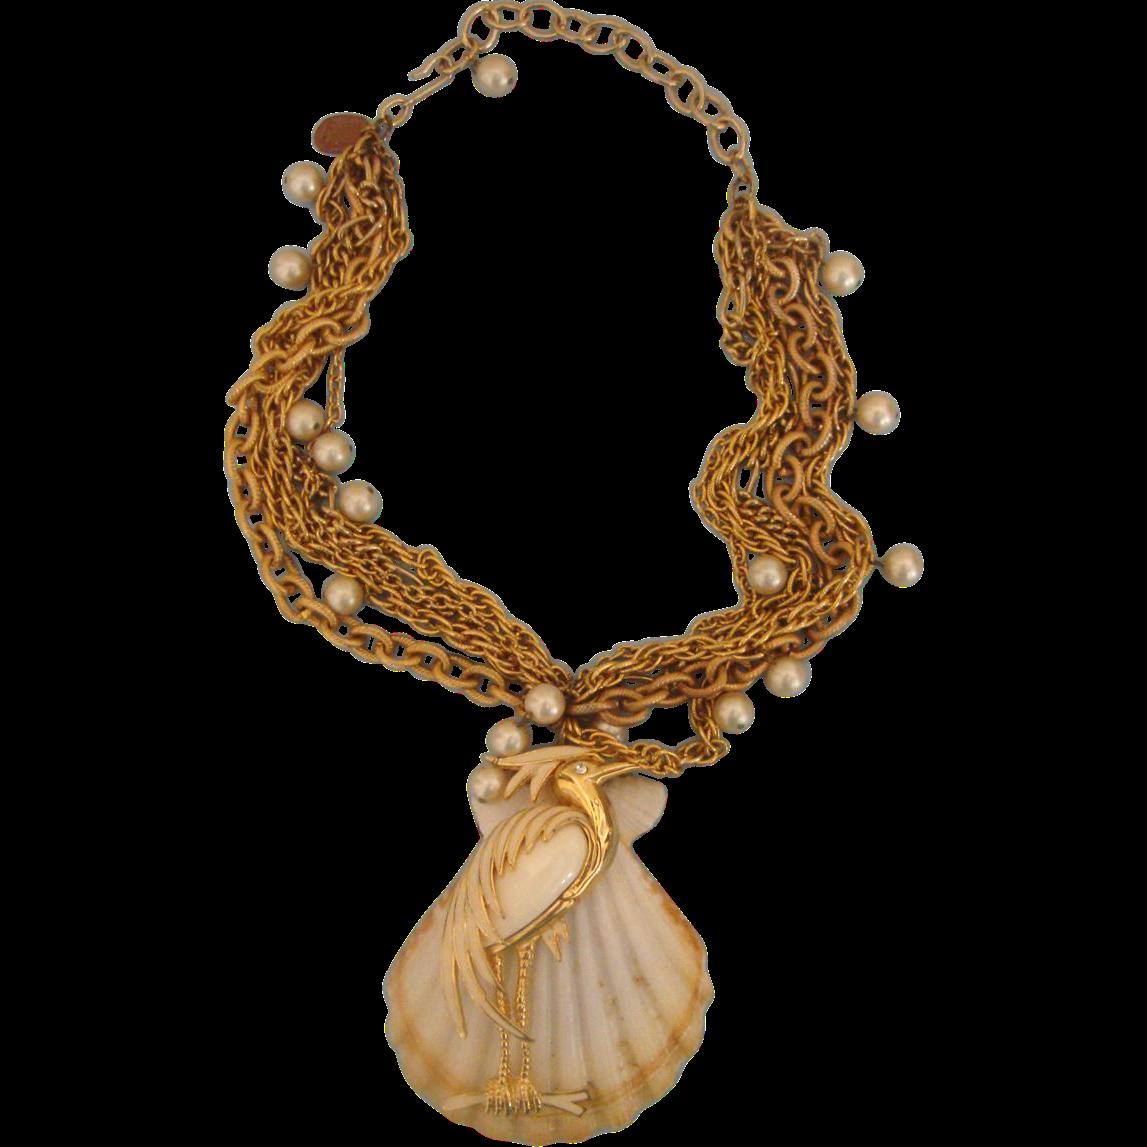 Heady & Huge Heron-on-Seashell Repurposed Necklace:  OOAK